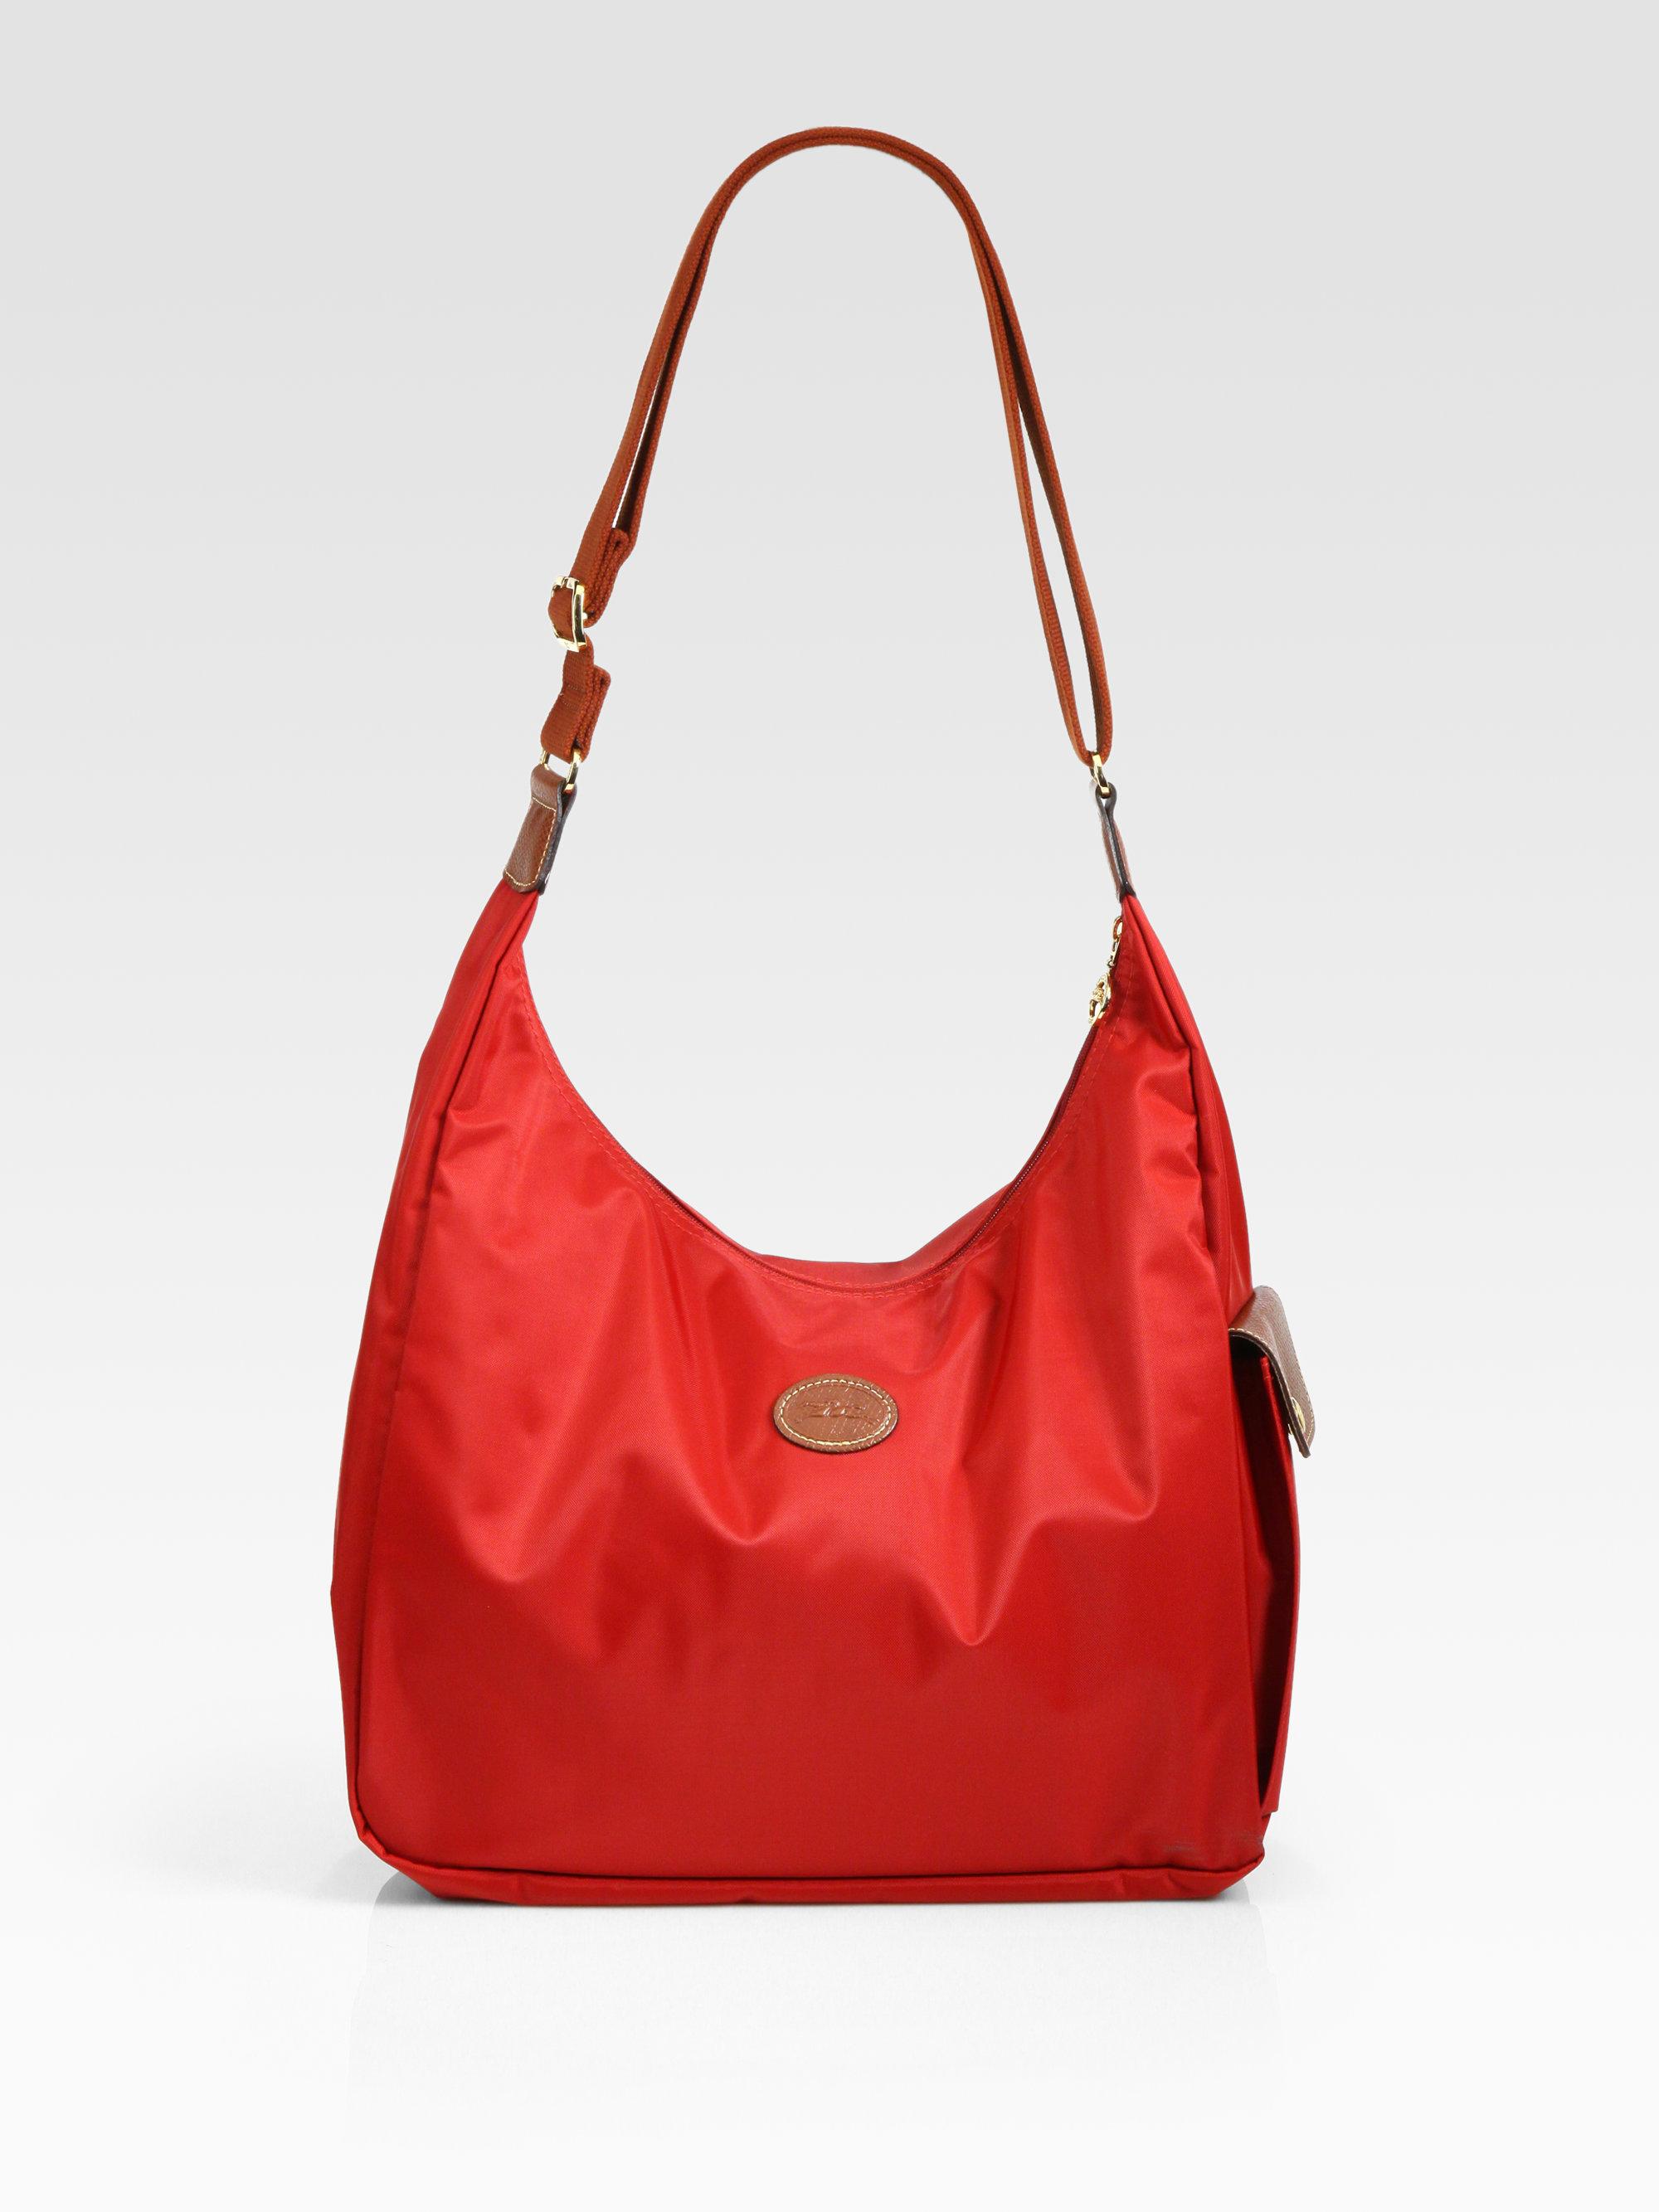 longchamp le pliage hobo bag in red lyst. Black Bedroom Furniture Sets. Home Design Ideas